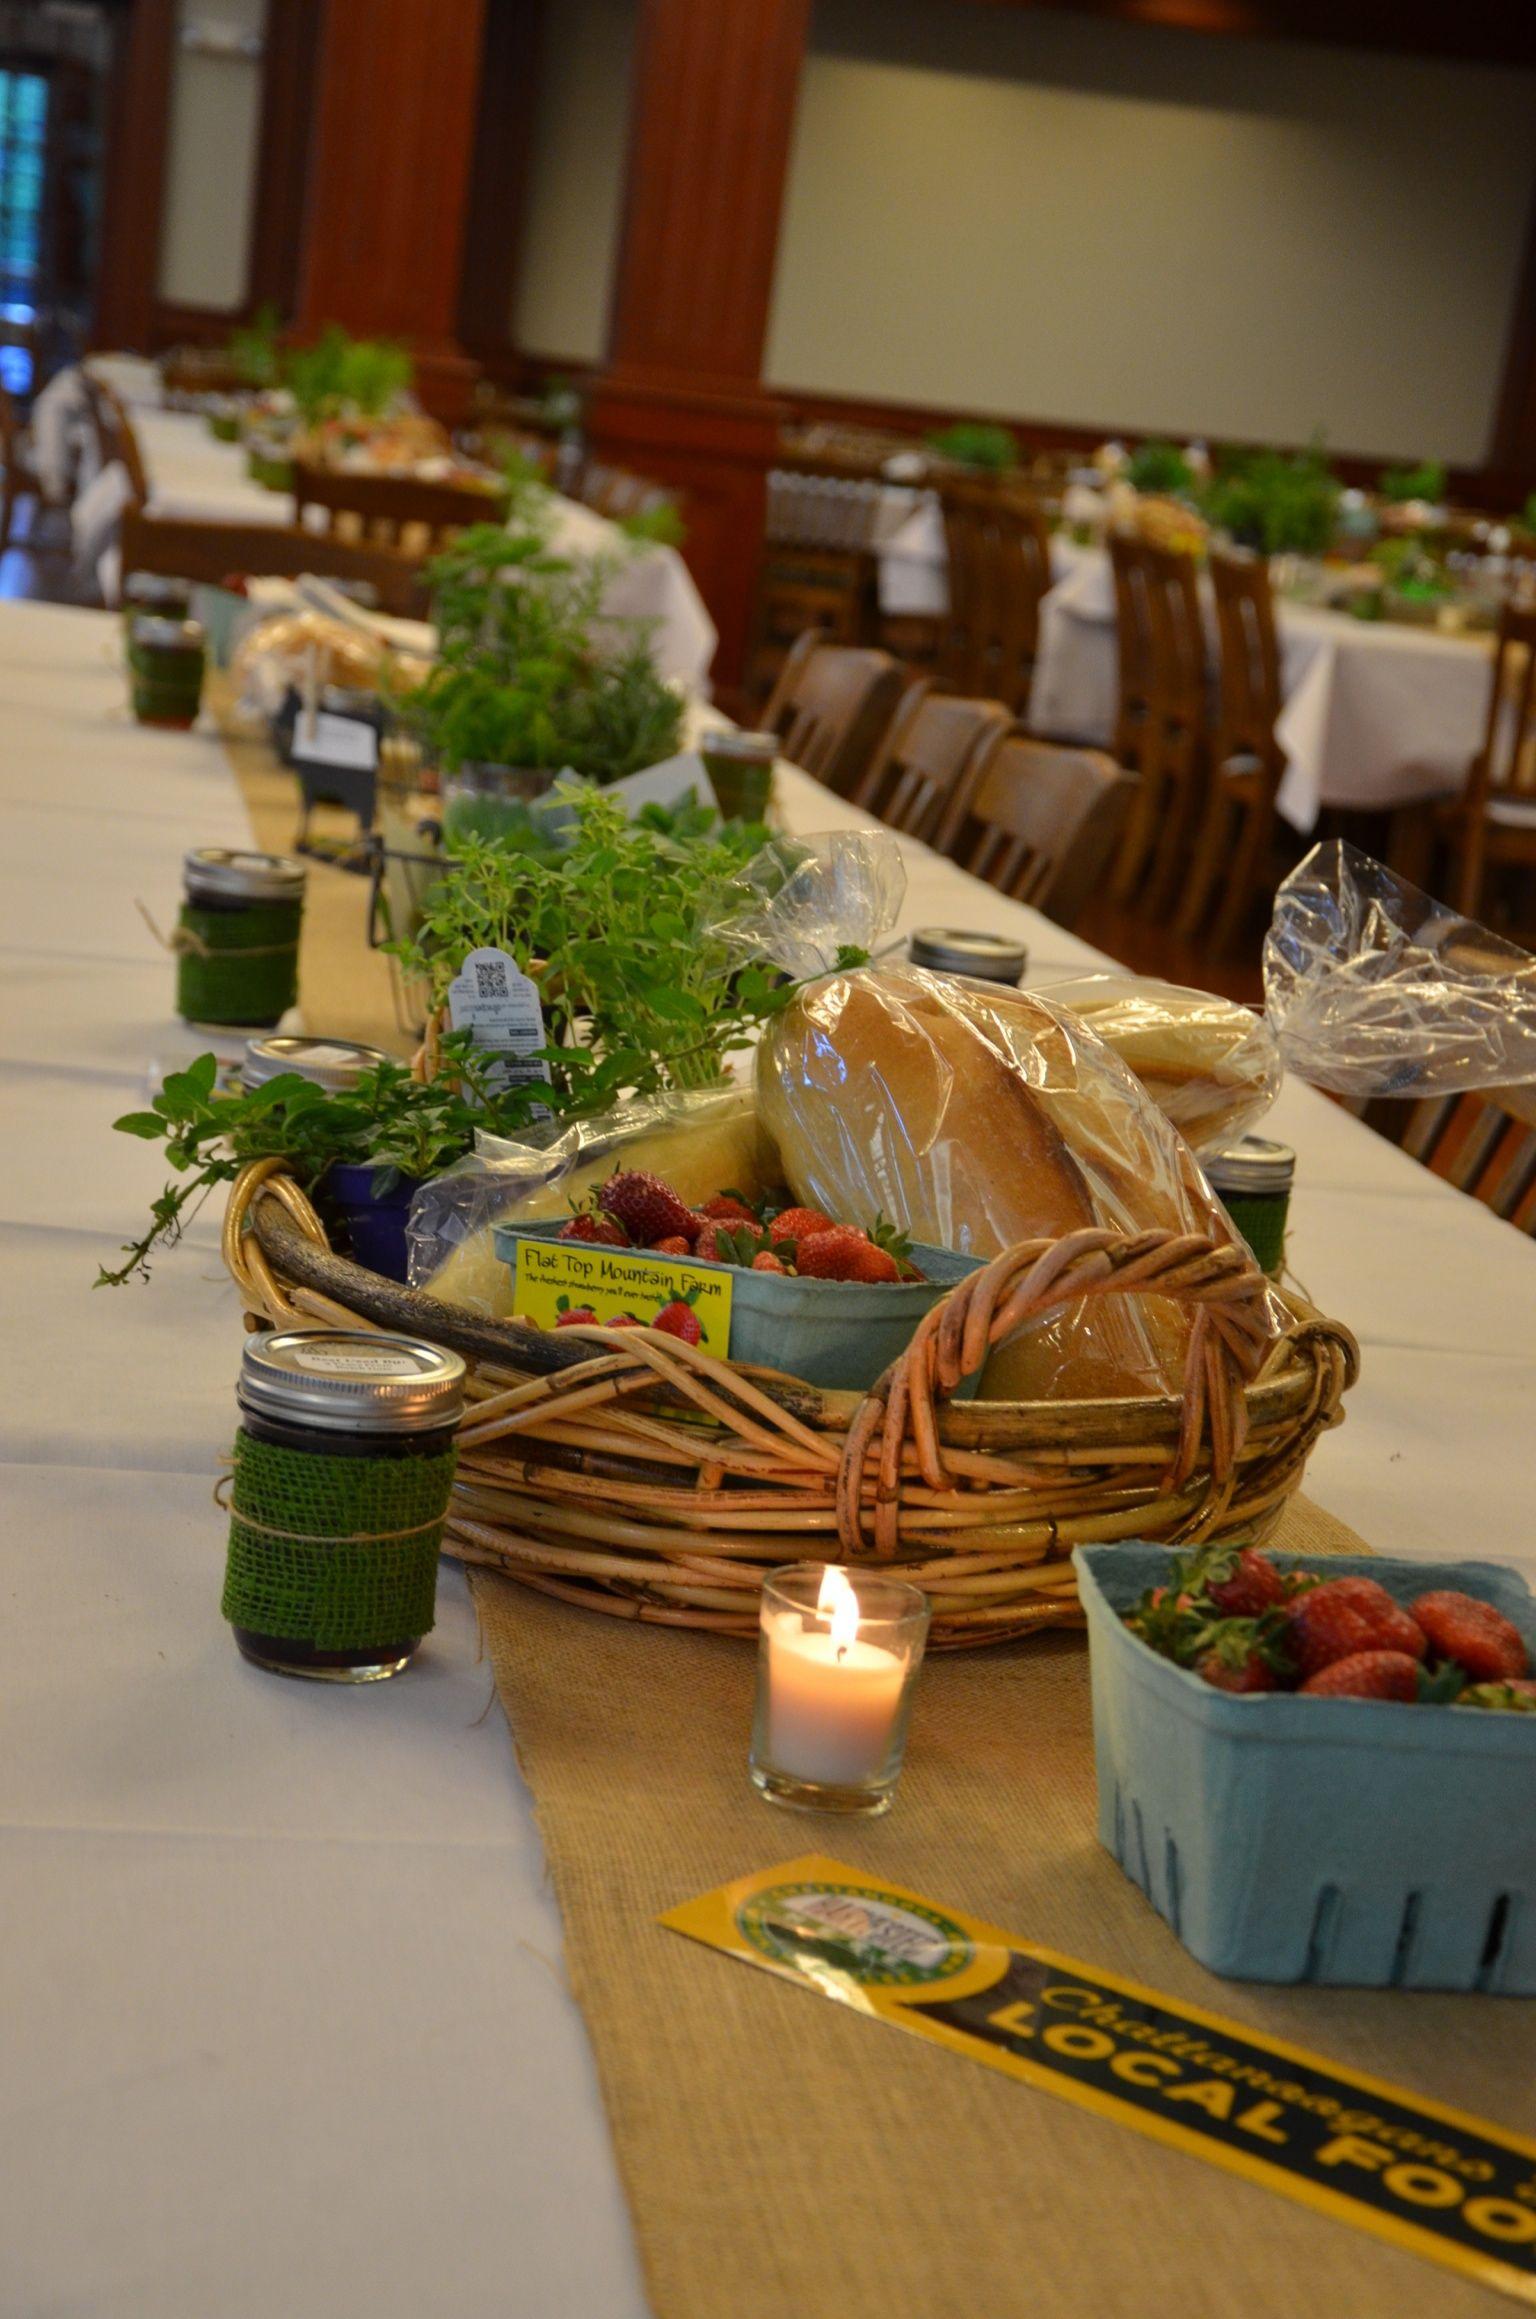 Table Decorations At Mccallie Teacher Appreciation